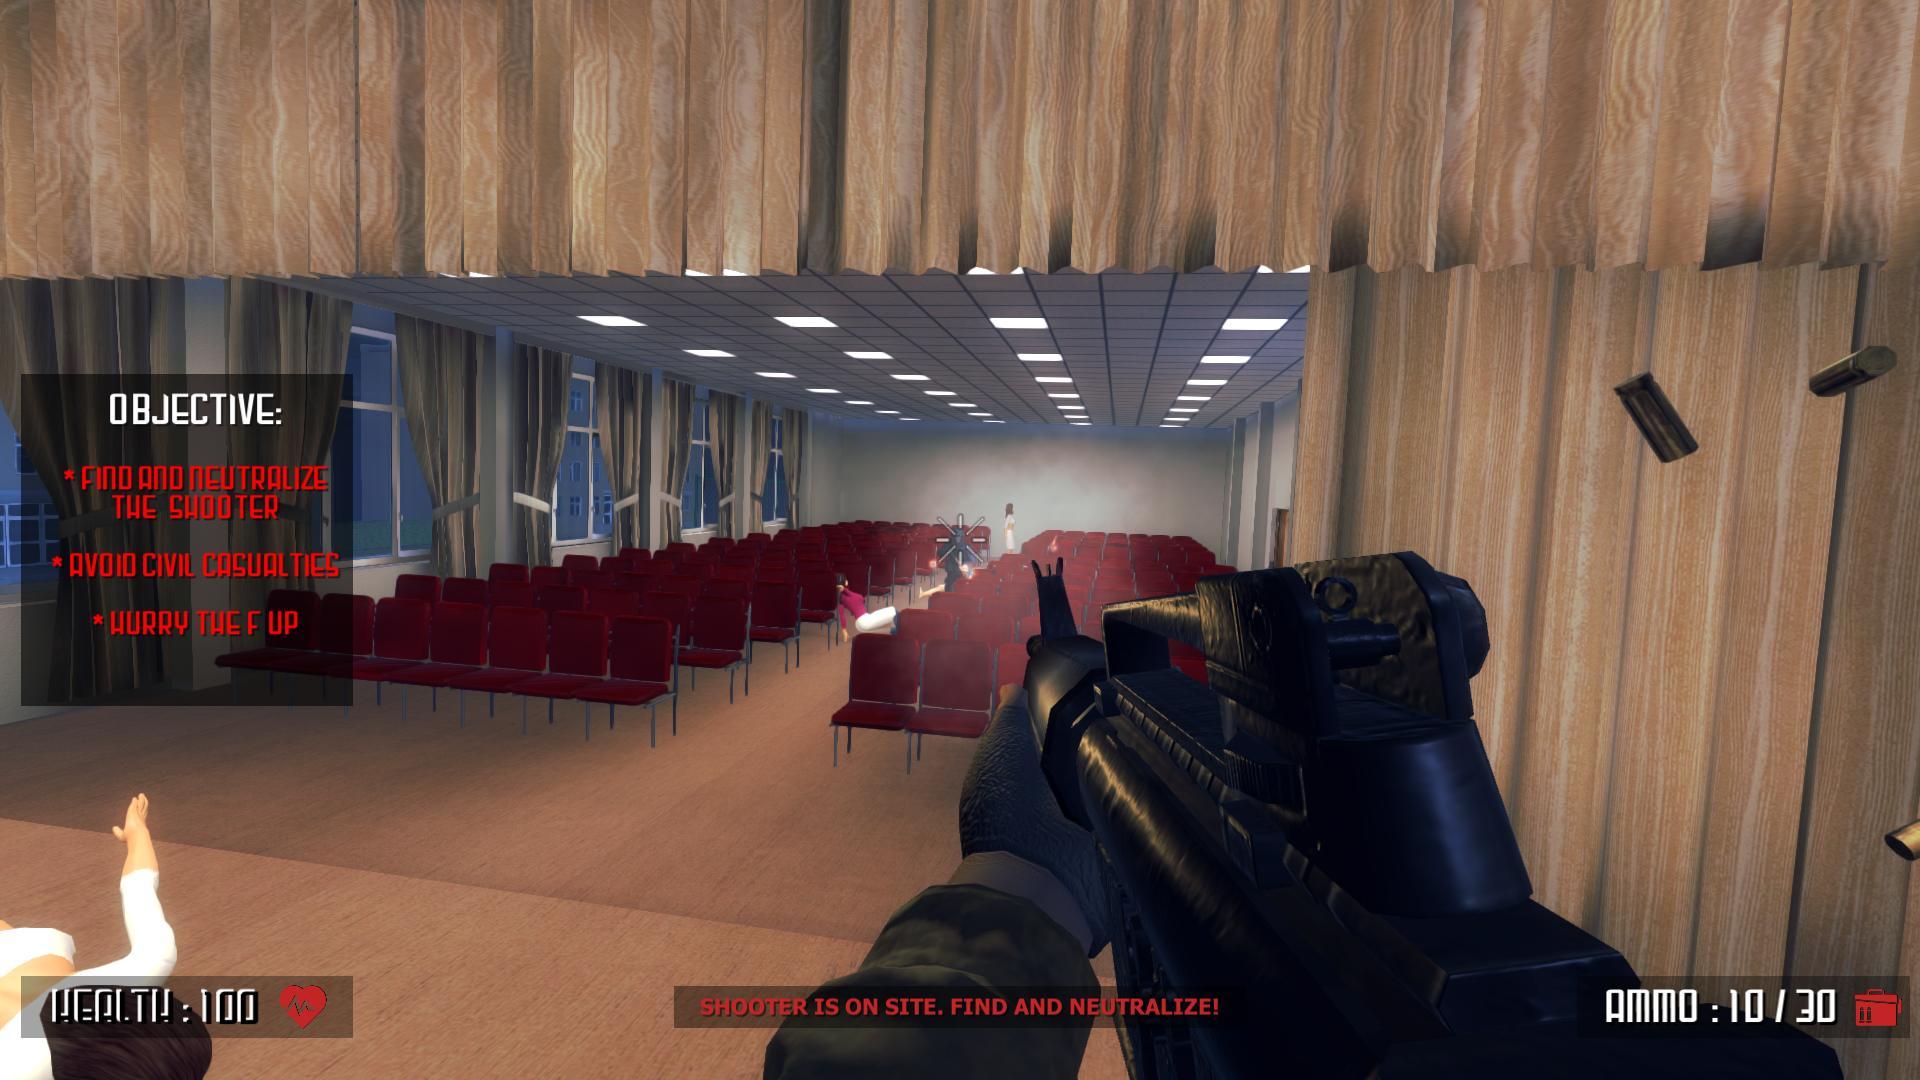 Cancelan lanzamiento en Estados Unidos de videojuego sobre tiroteo en escuela